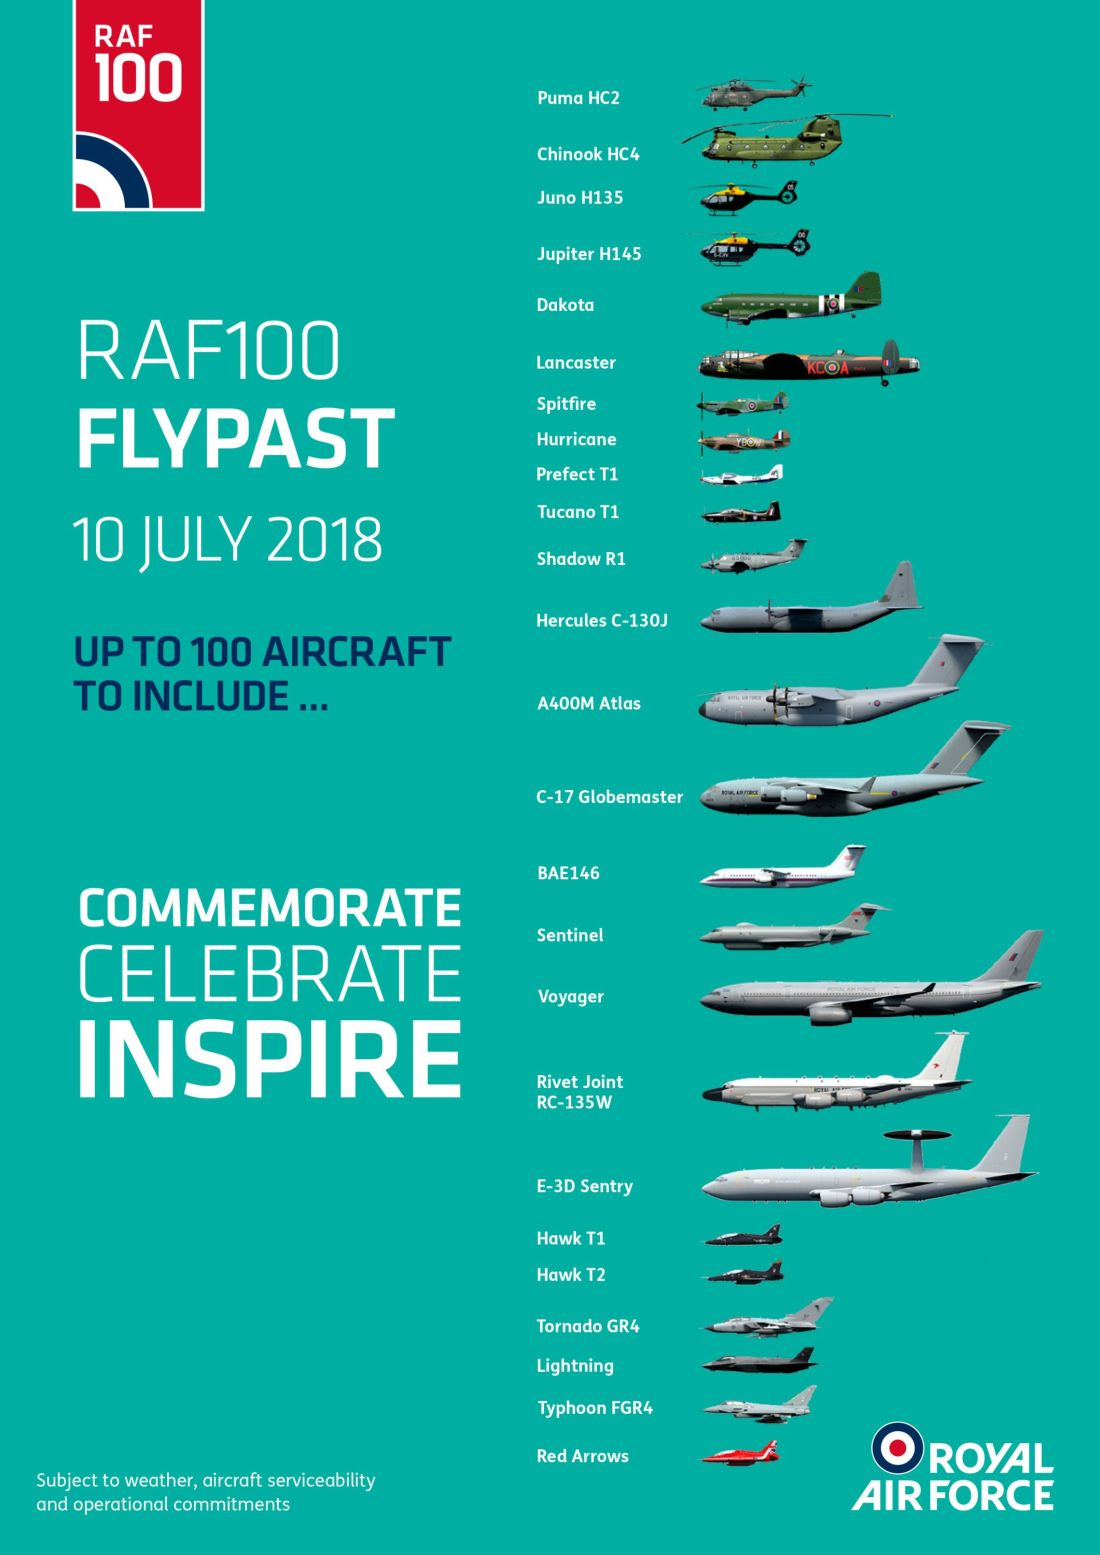 RAF100FlypastFormationwithF35(1)